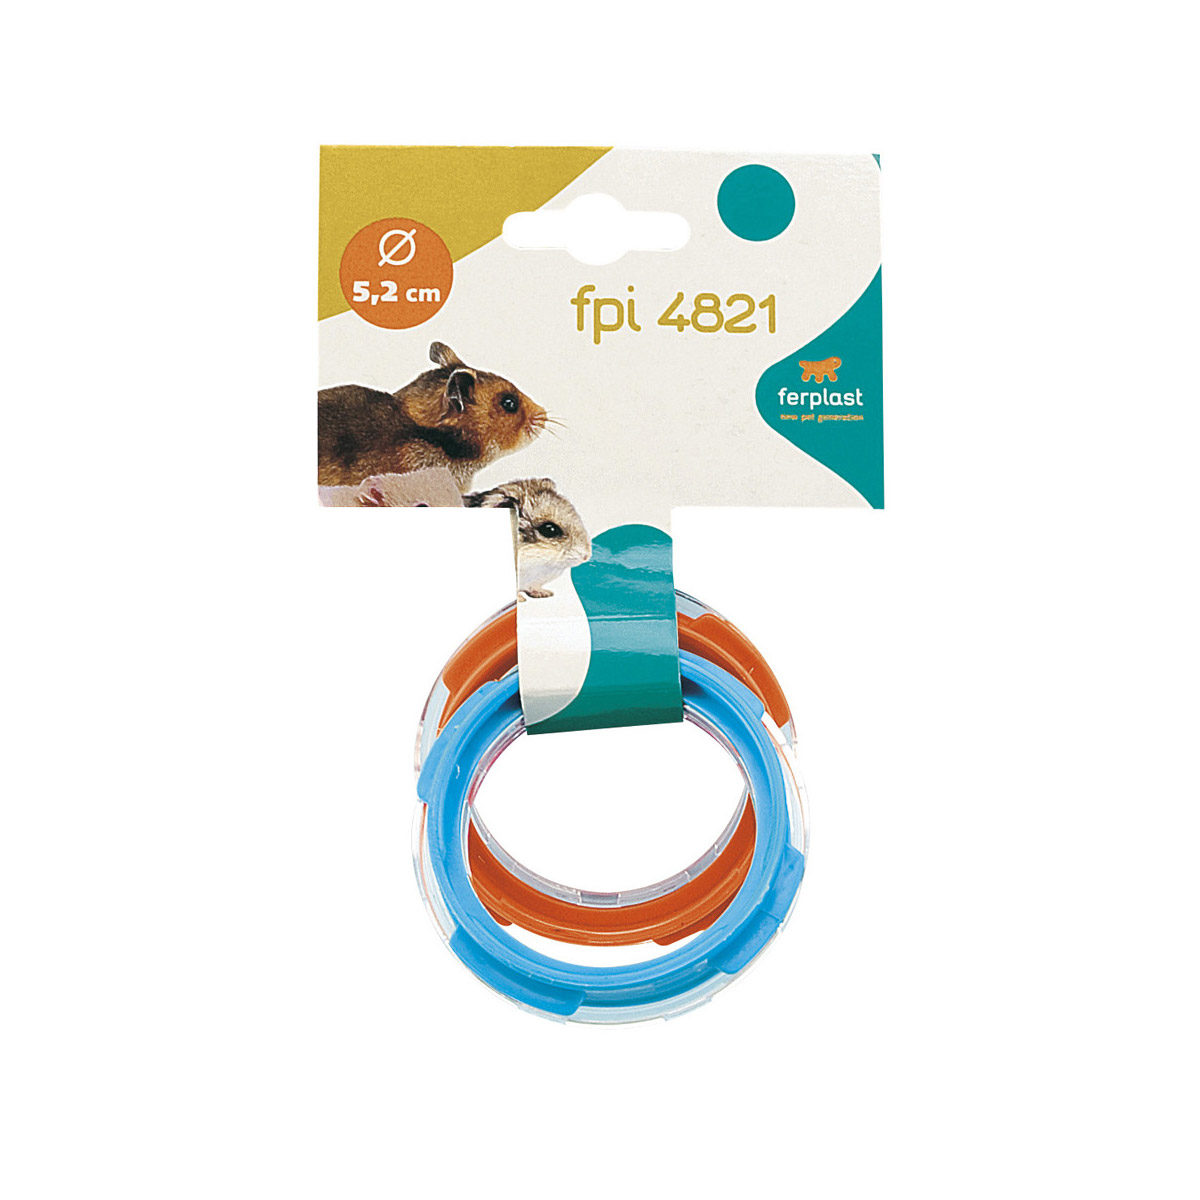 Ferplast Verbindingsring FPI 4821 Oranje&Blauw